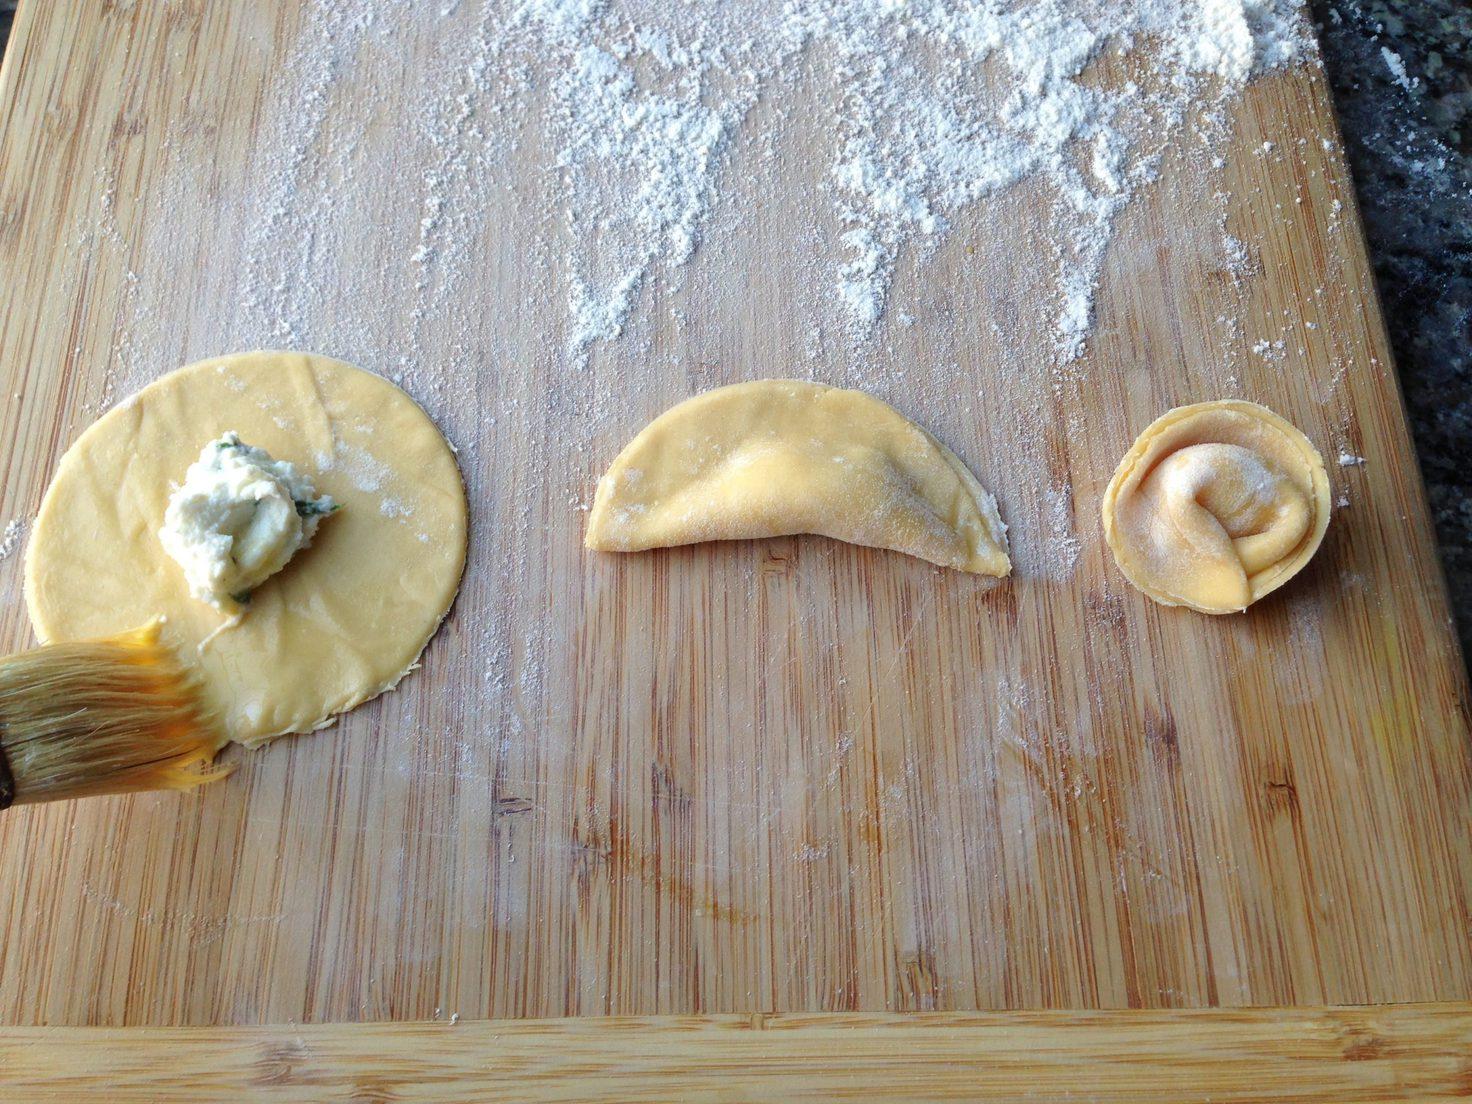 Shaping tortellini pasta